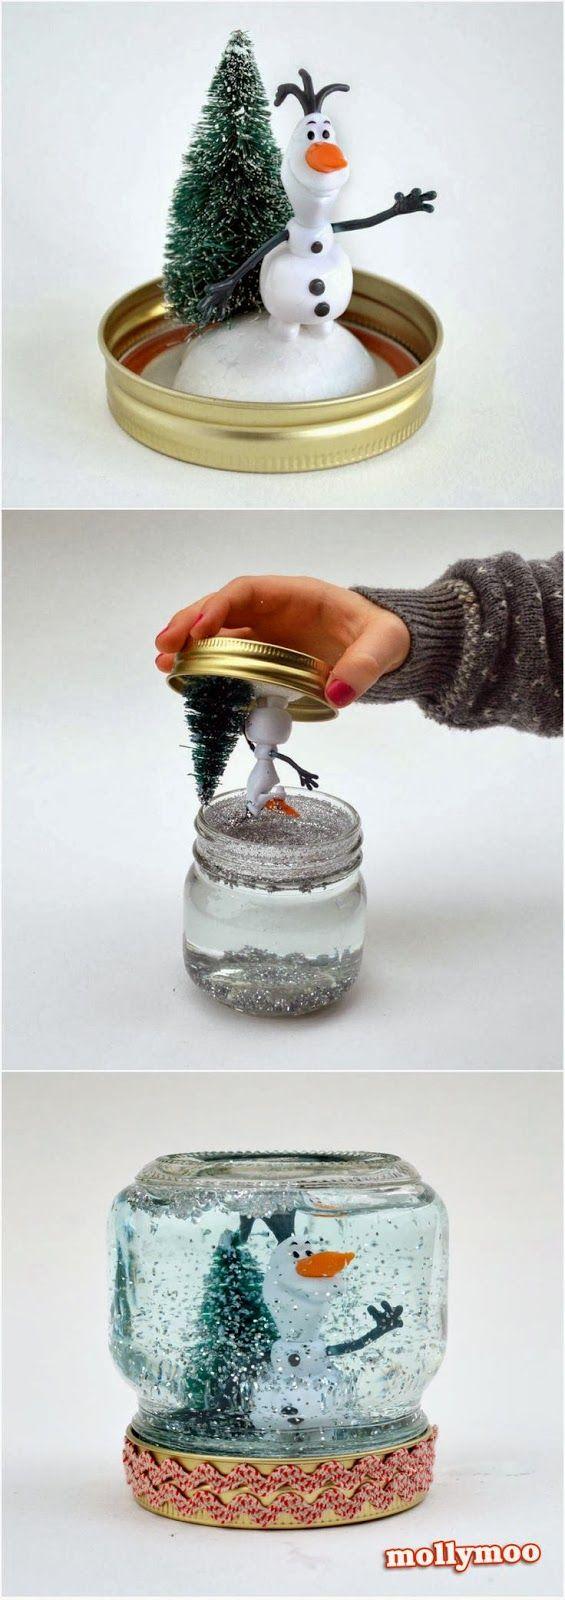 Christmas Crafts: How to Make A Snow Globe